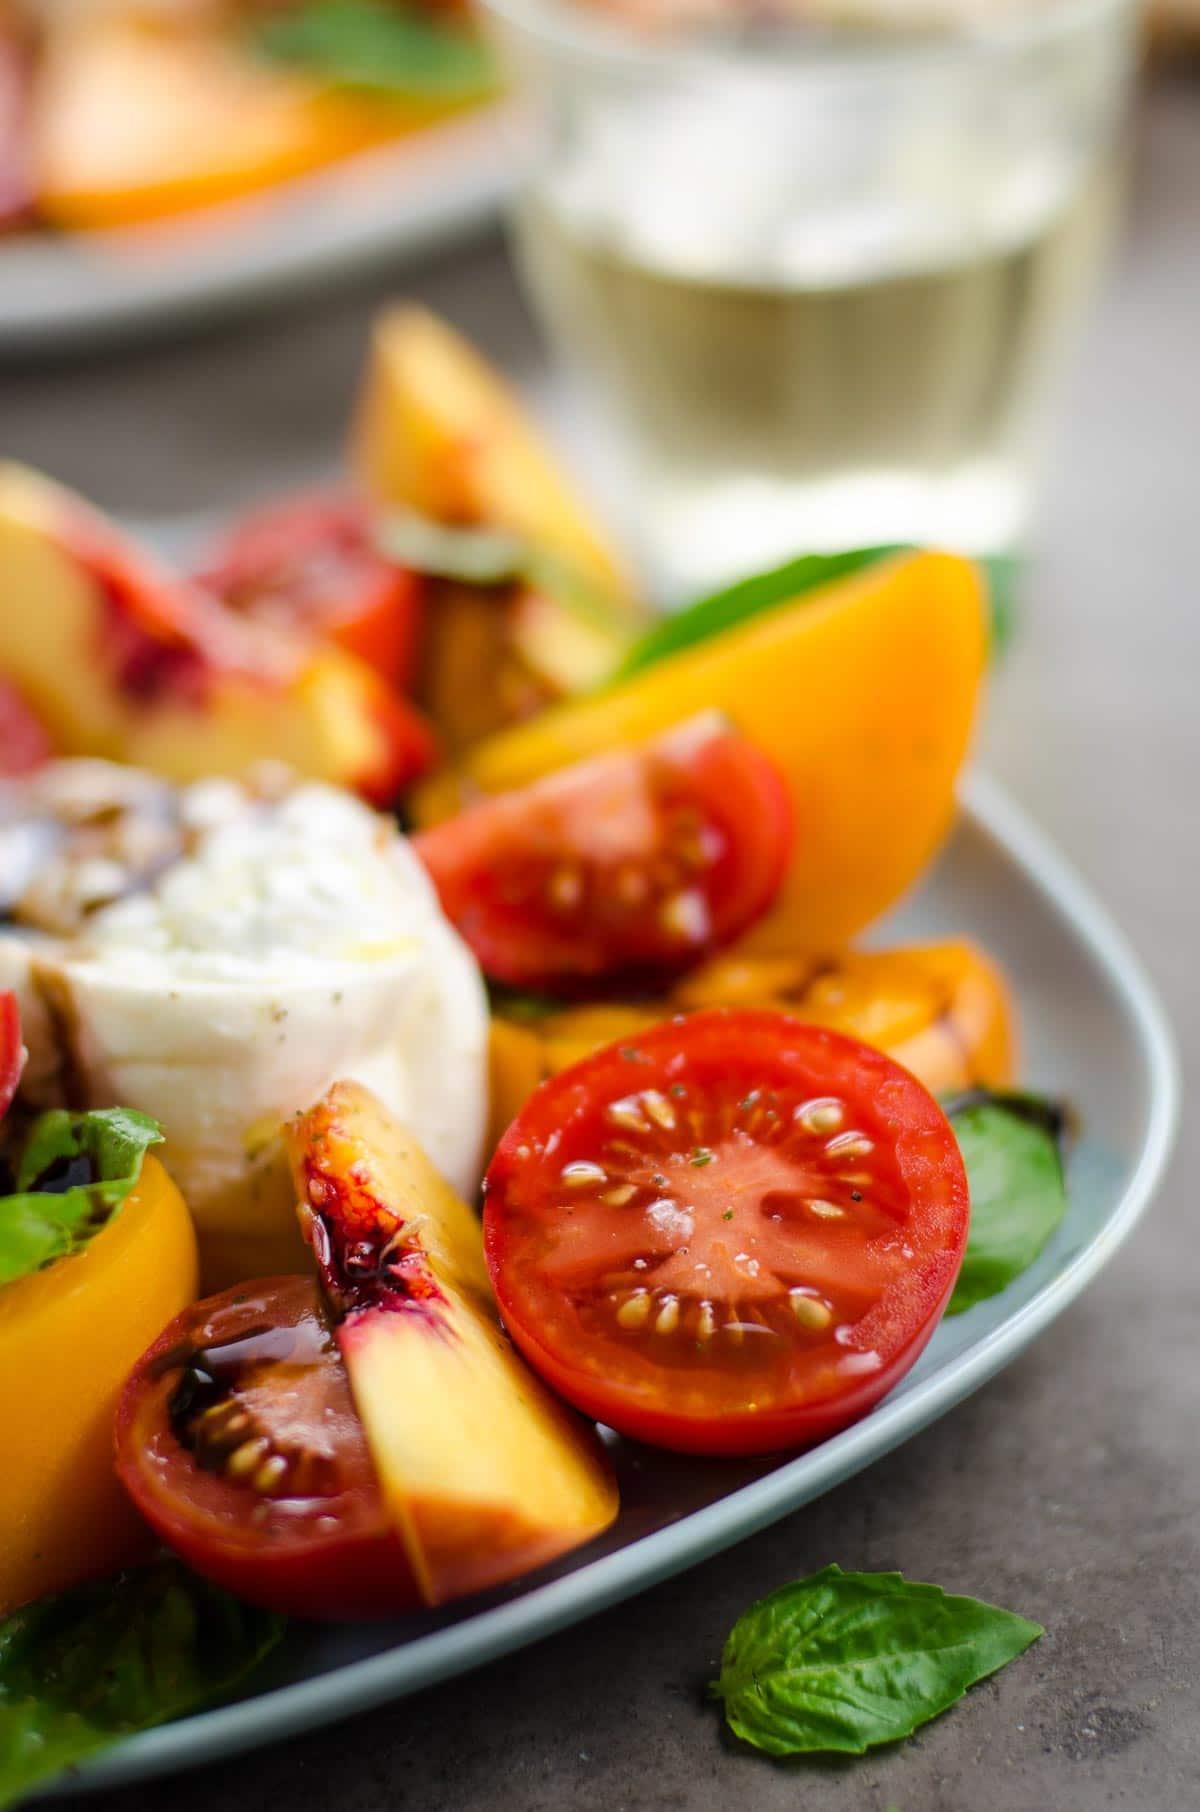 tomato nectarine burrata salad on plates with a glass of white wine